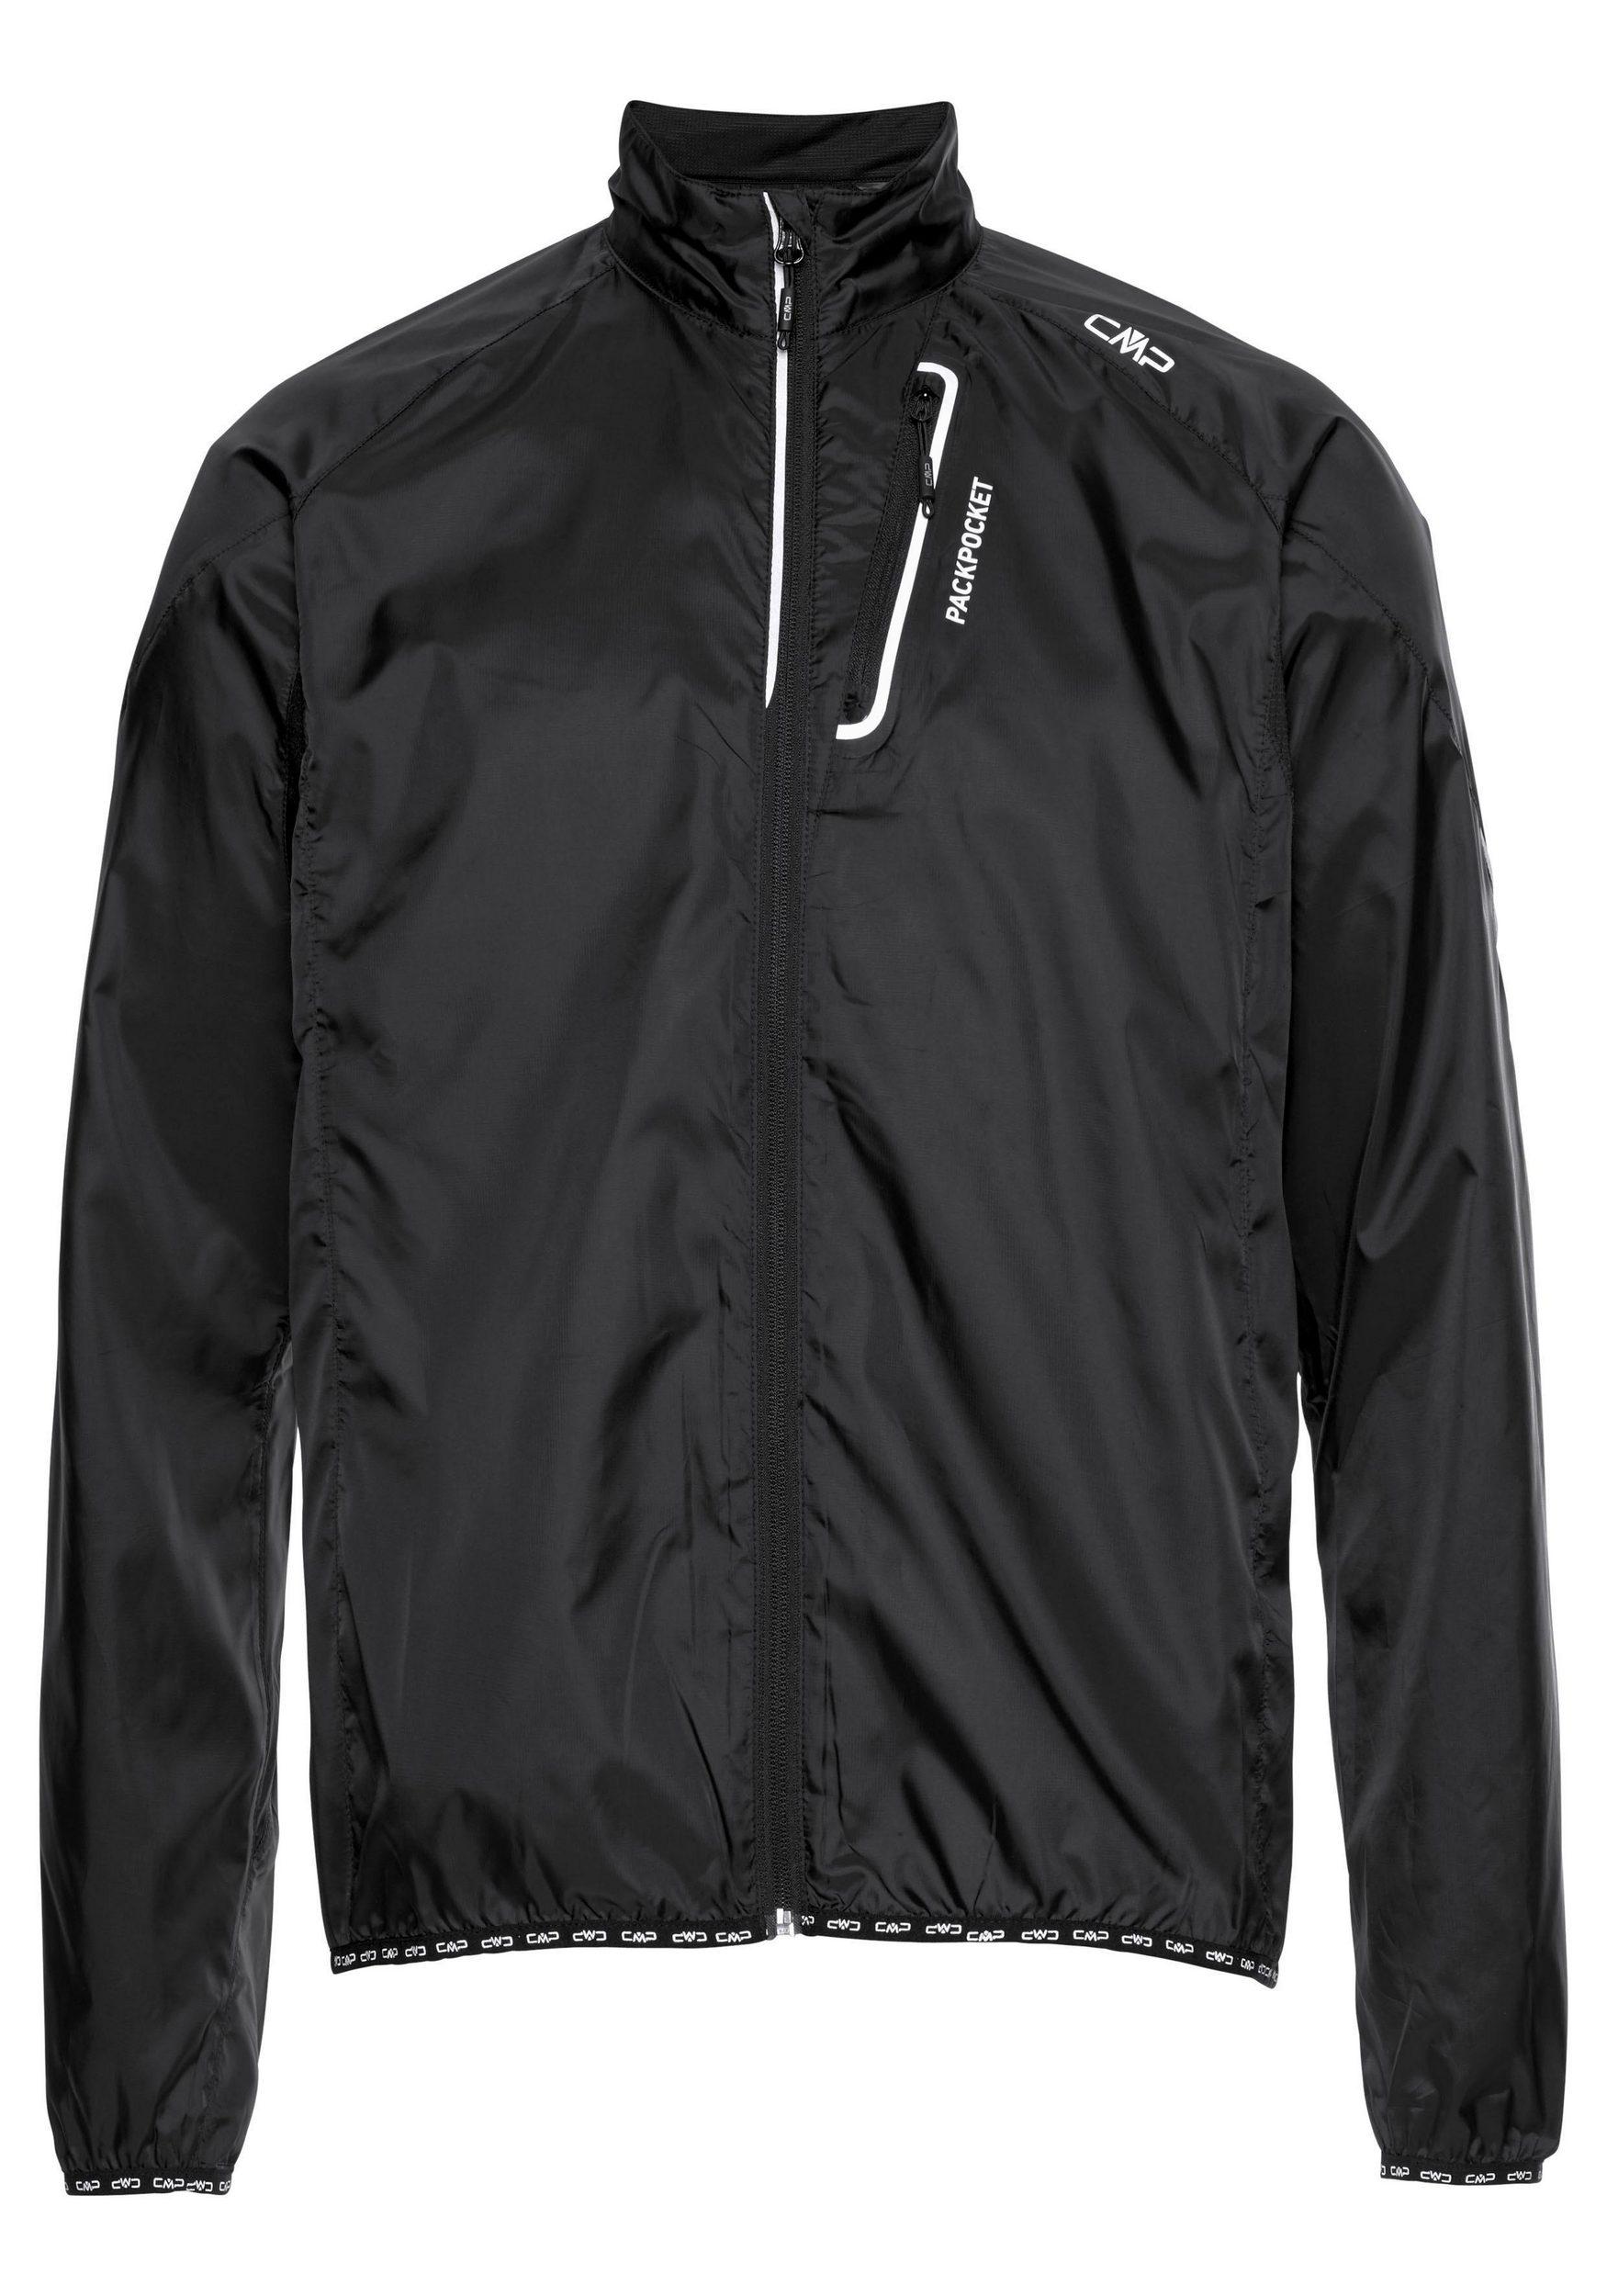 CMP Herren Fahrradjacke Windbreaker 3C46777T schwarz